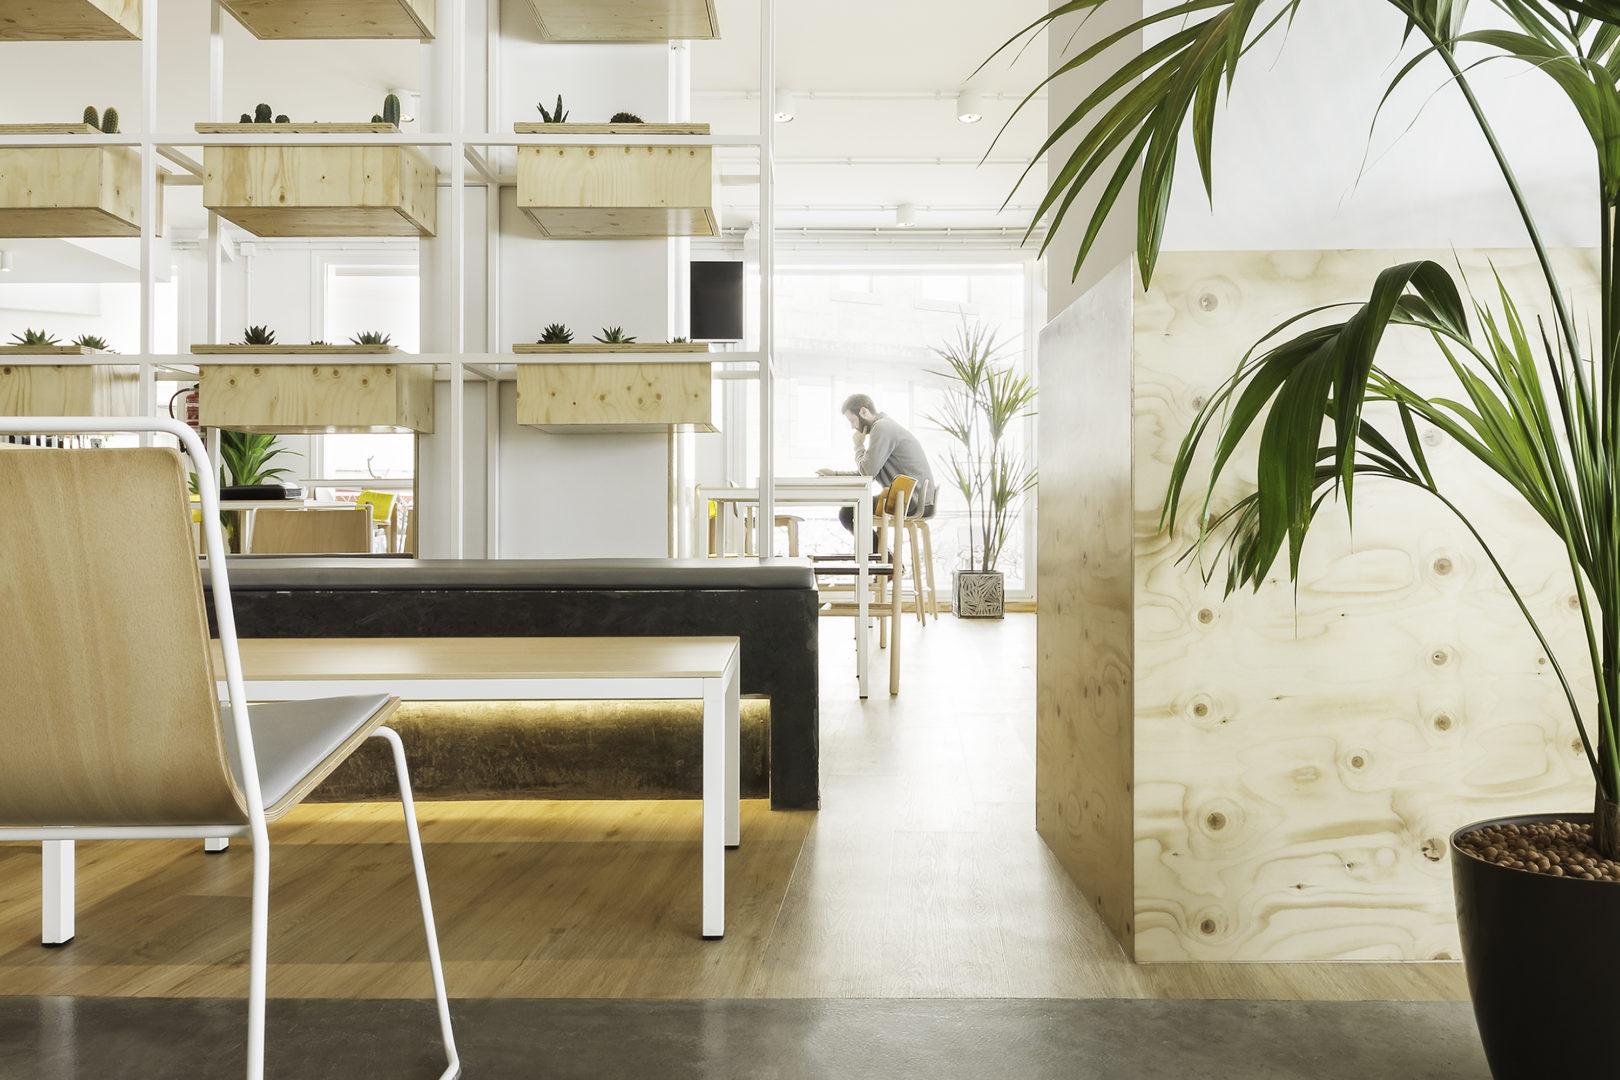 Nanarquitectos Nancontract Interiorismo Diseño Reformas Cafeteria Dorsia